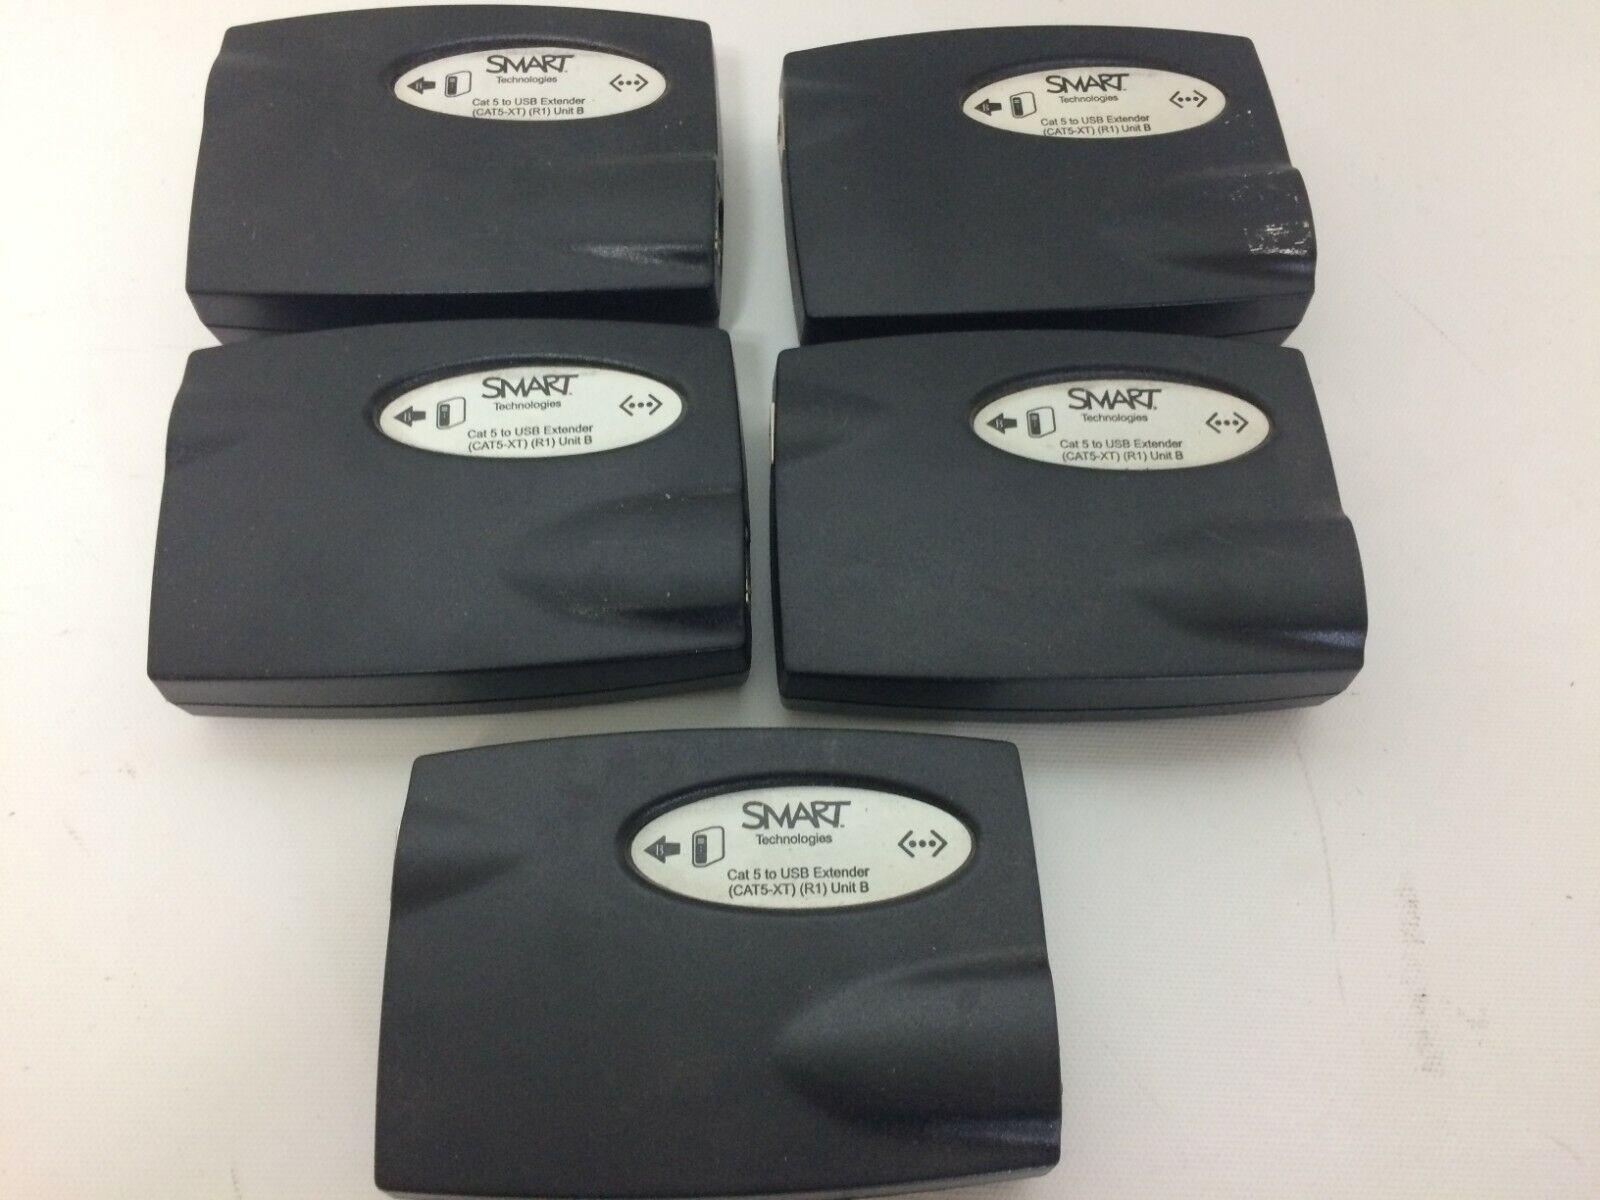 Lot of 5 Smart Technologies CAT 5 to USB Extenders (CAT5-XT) (R1) Unit B